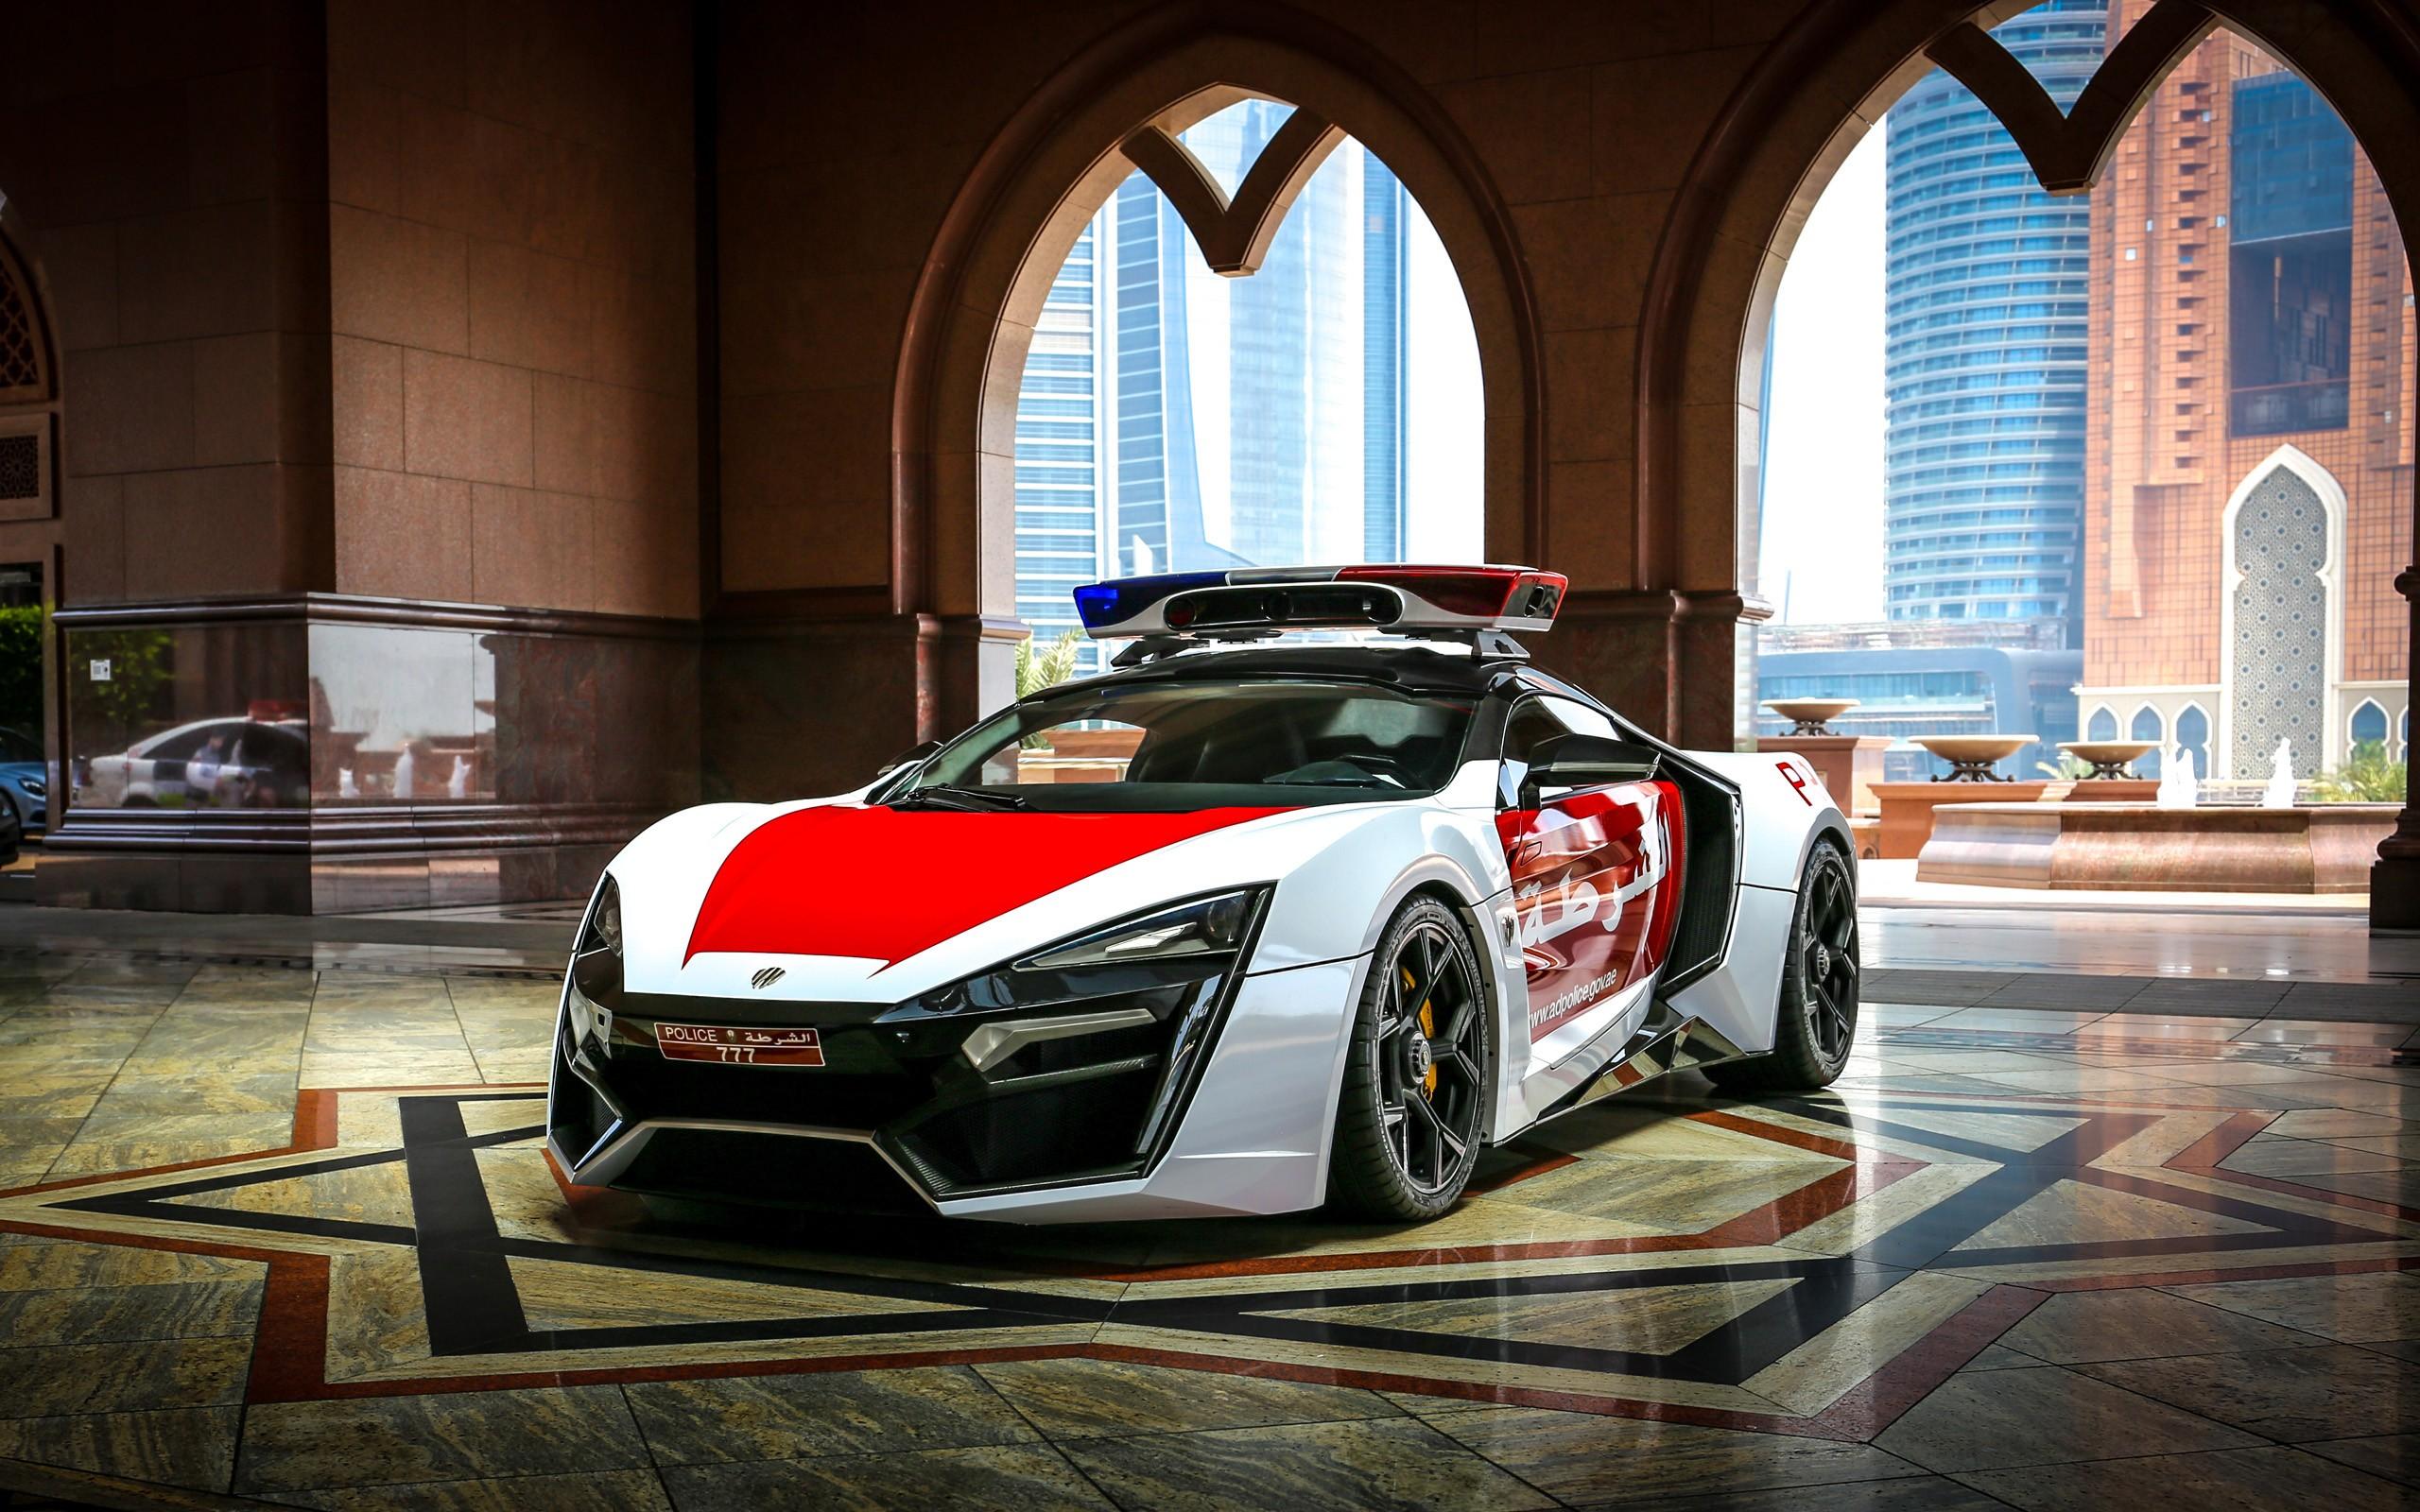 Cars Wallpaper Hd For Desktop 2015 2015 W Motors Lykan Hypersport Abu Dhabi Police Wallpaper